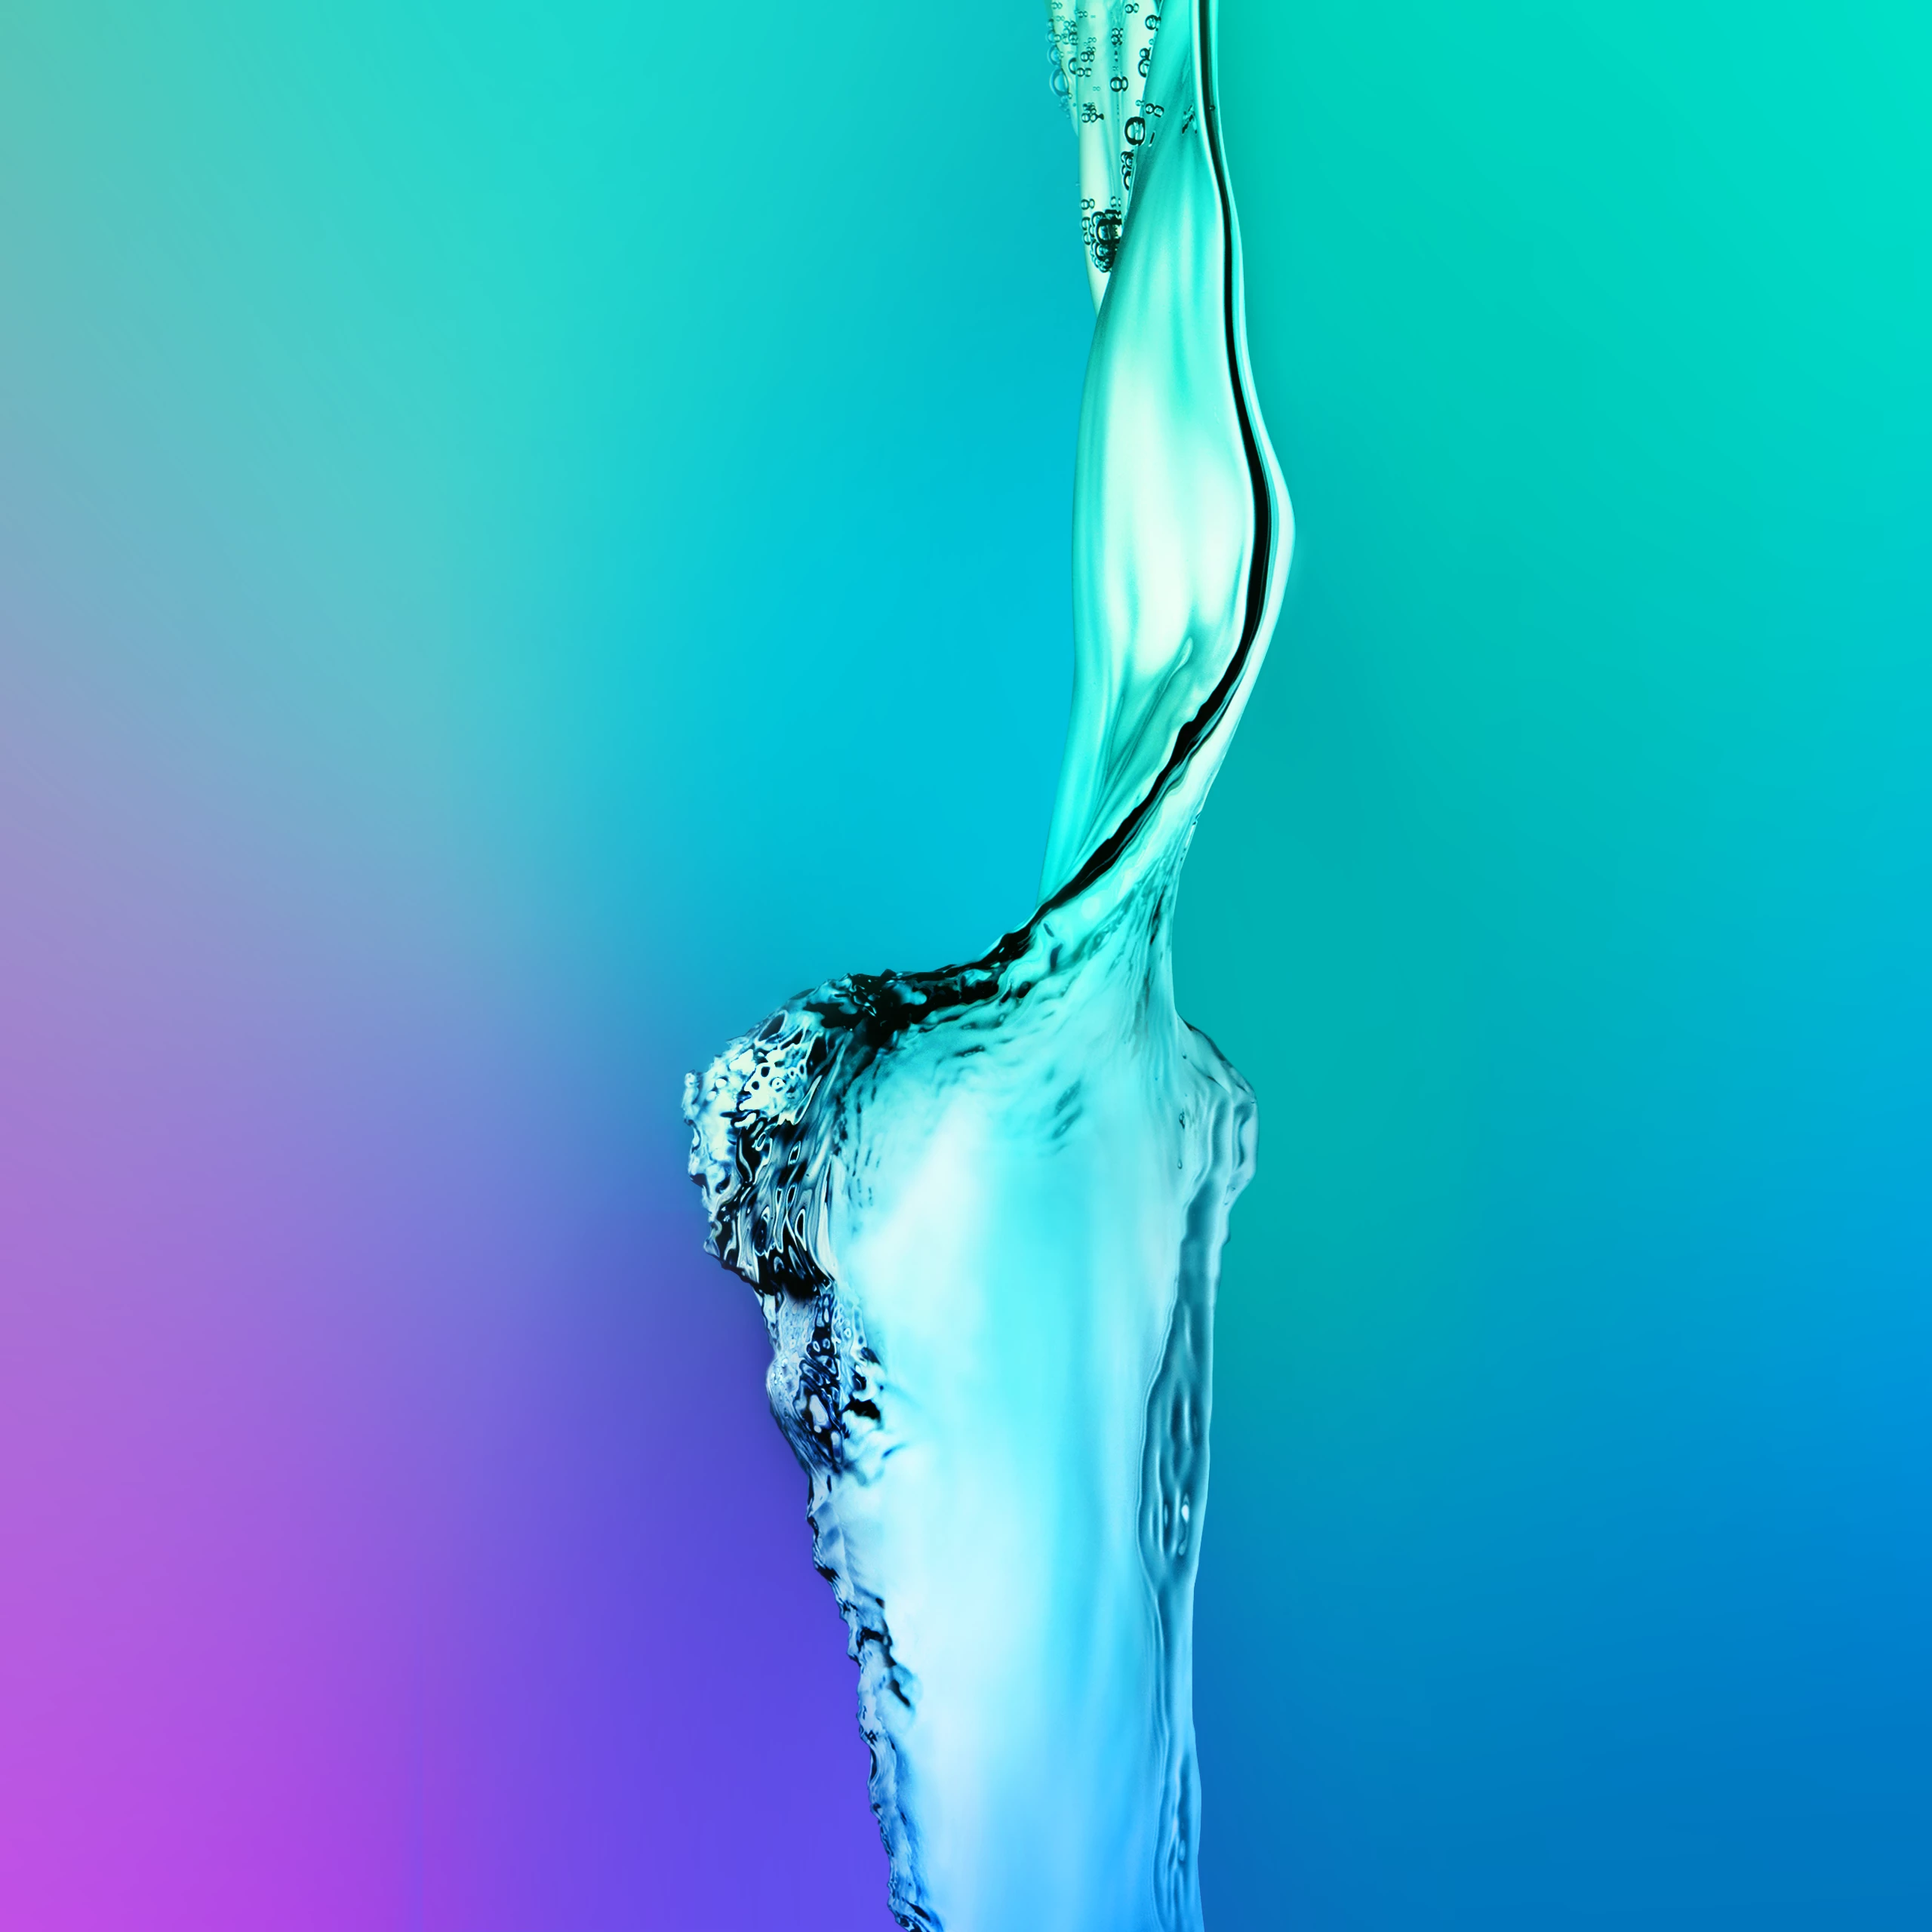 Wallpaper download j2 - Galaxy S8